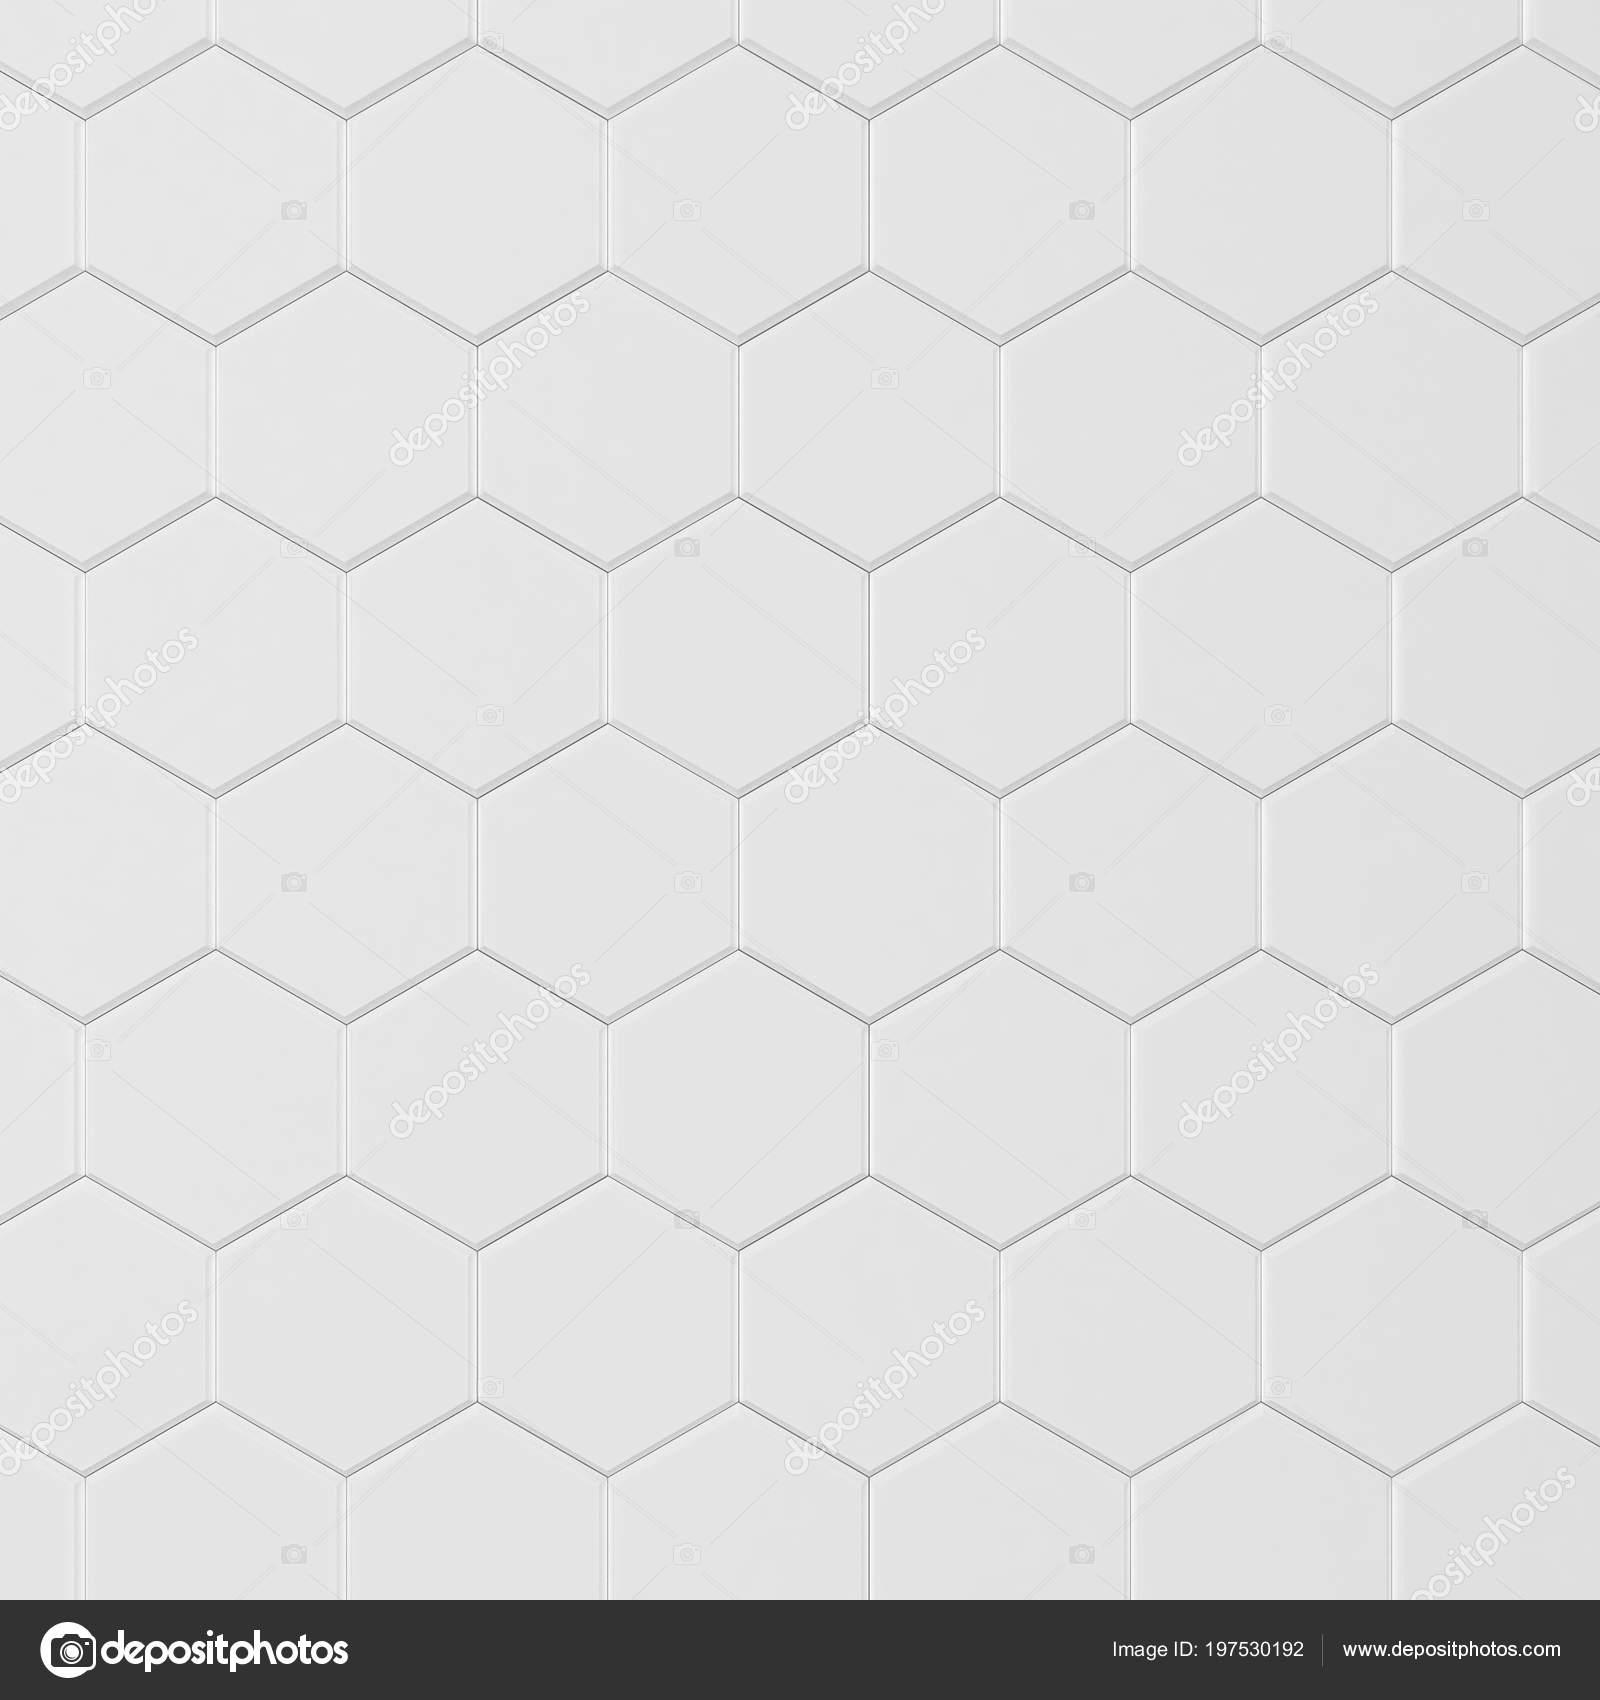 Carrelage Hexagonal Blanc Fond Photographie Montego - Carrelage hexagonal blanc